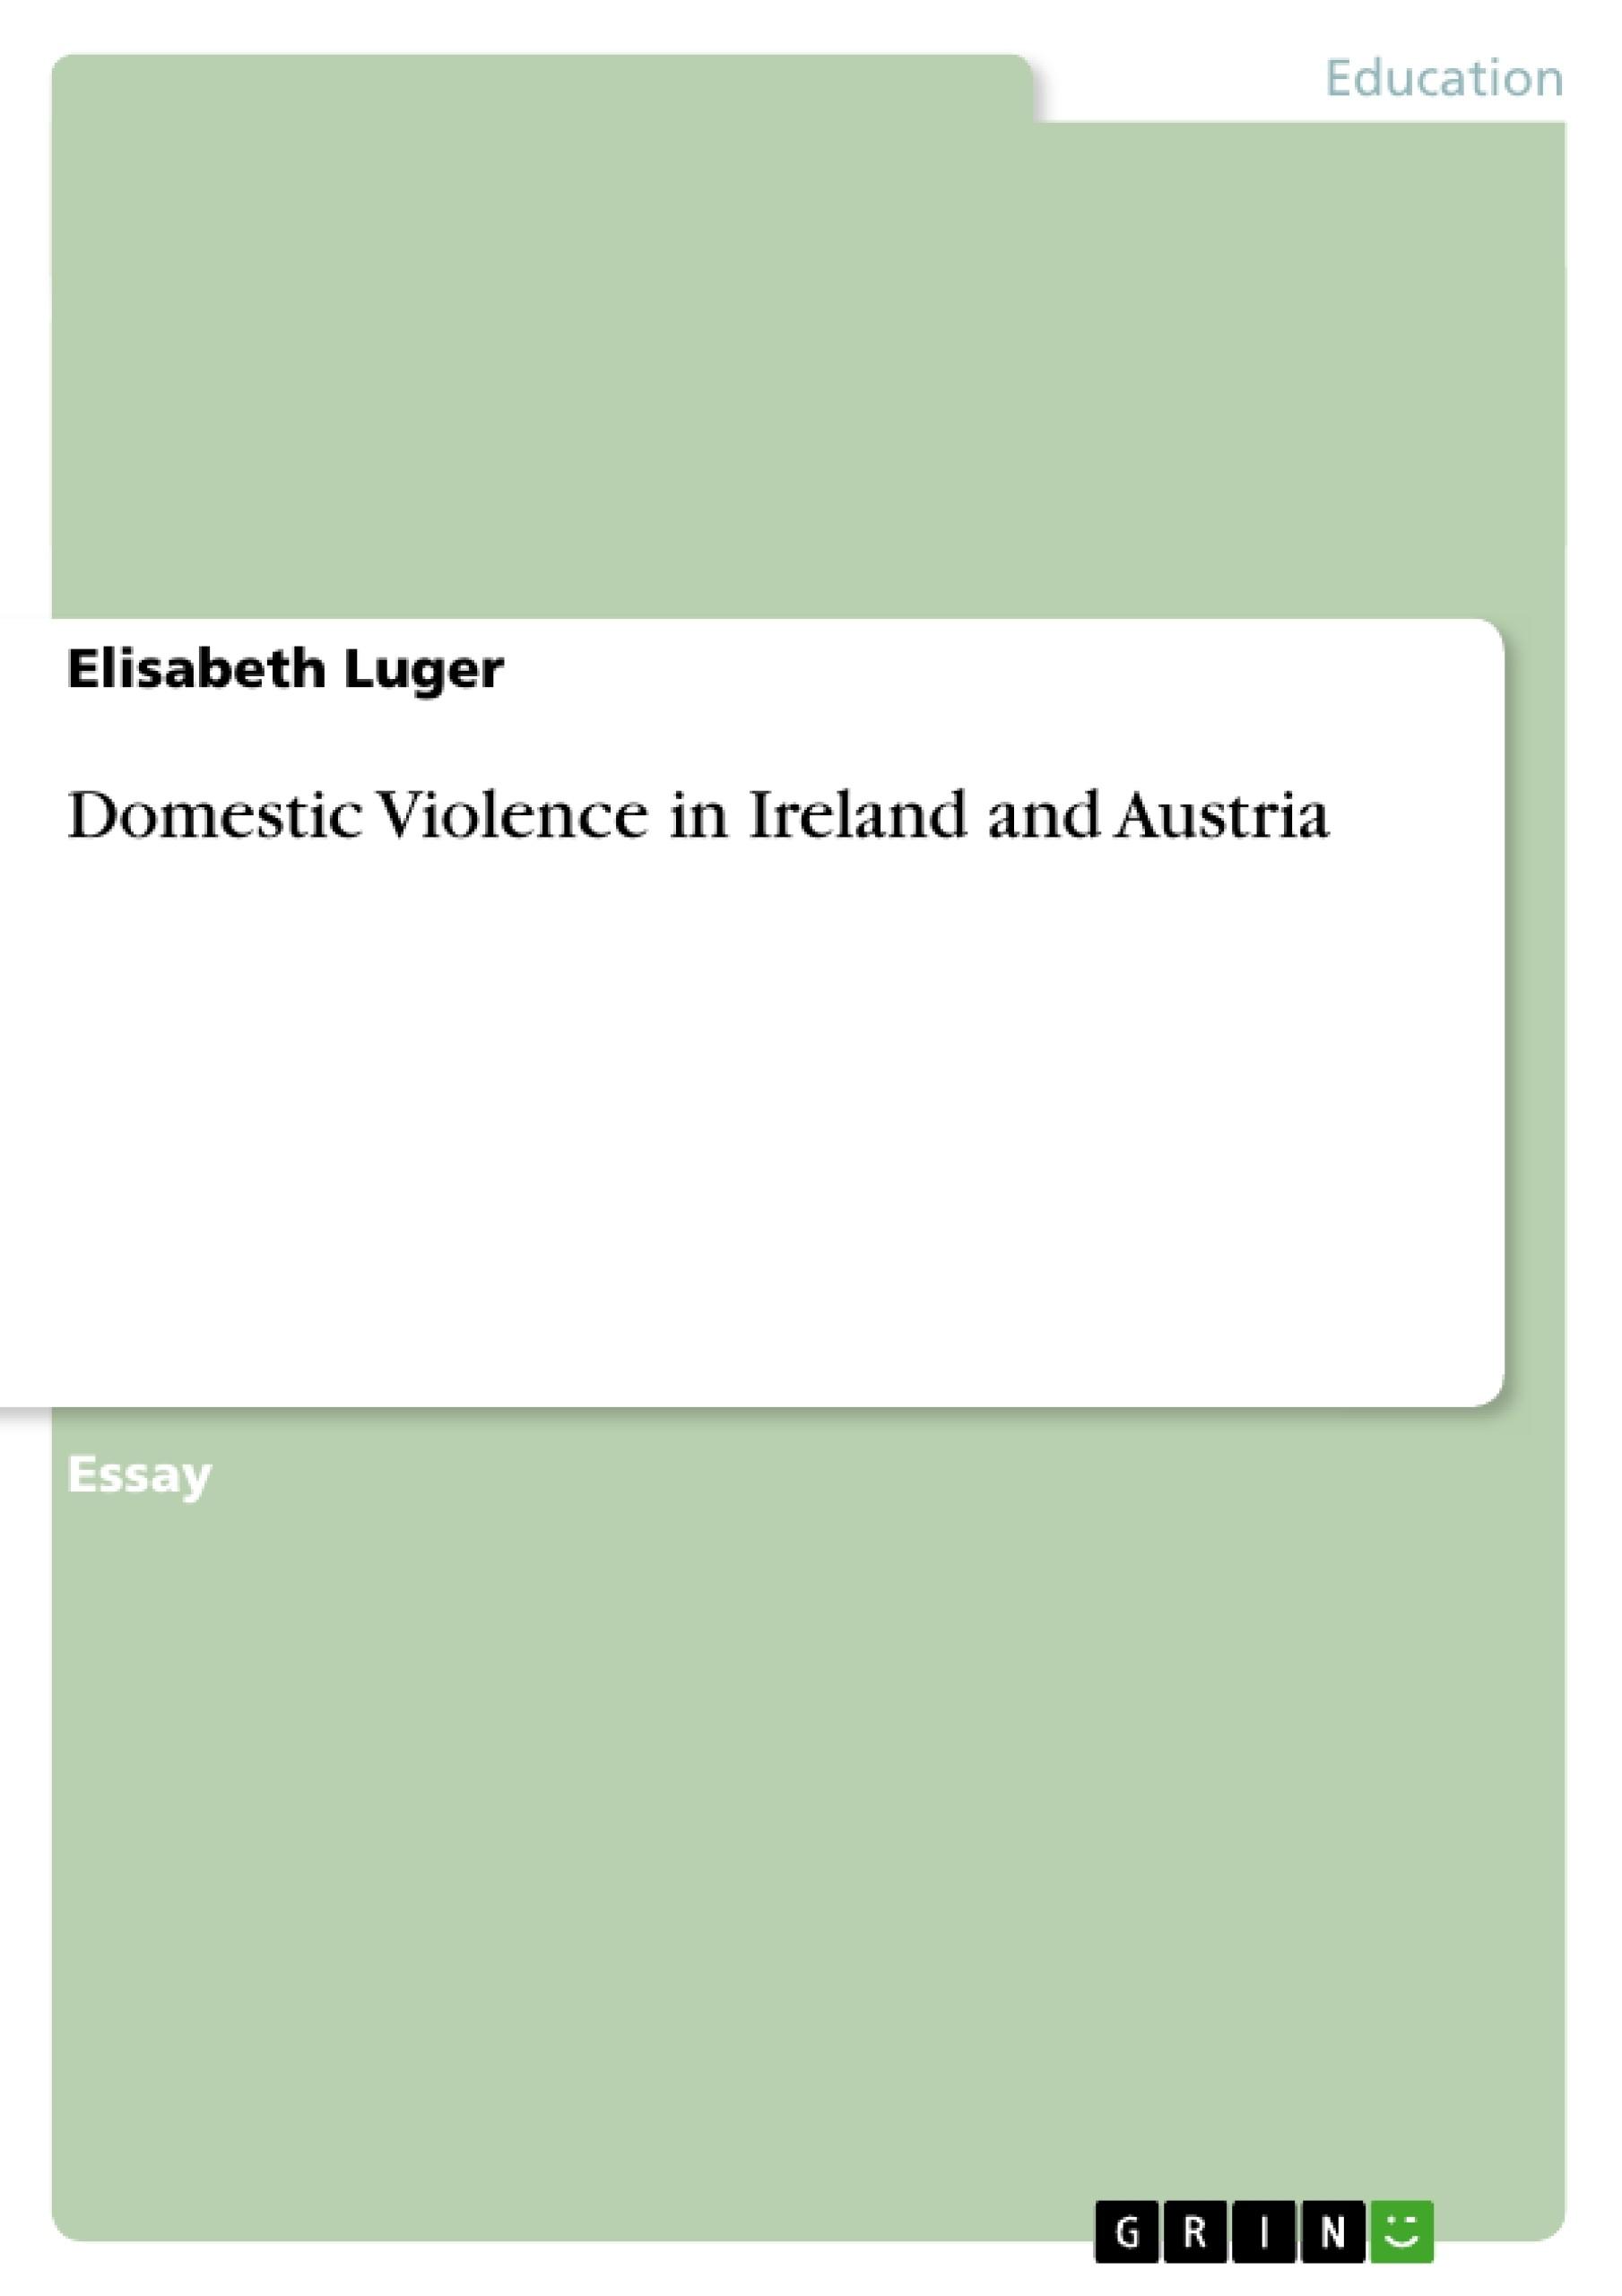 Title: Domestic Violence in Ireland and Austria